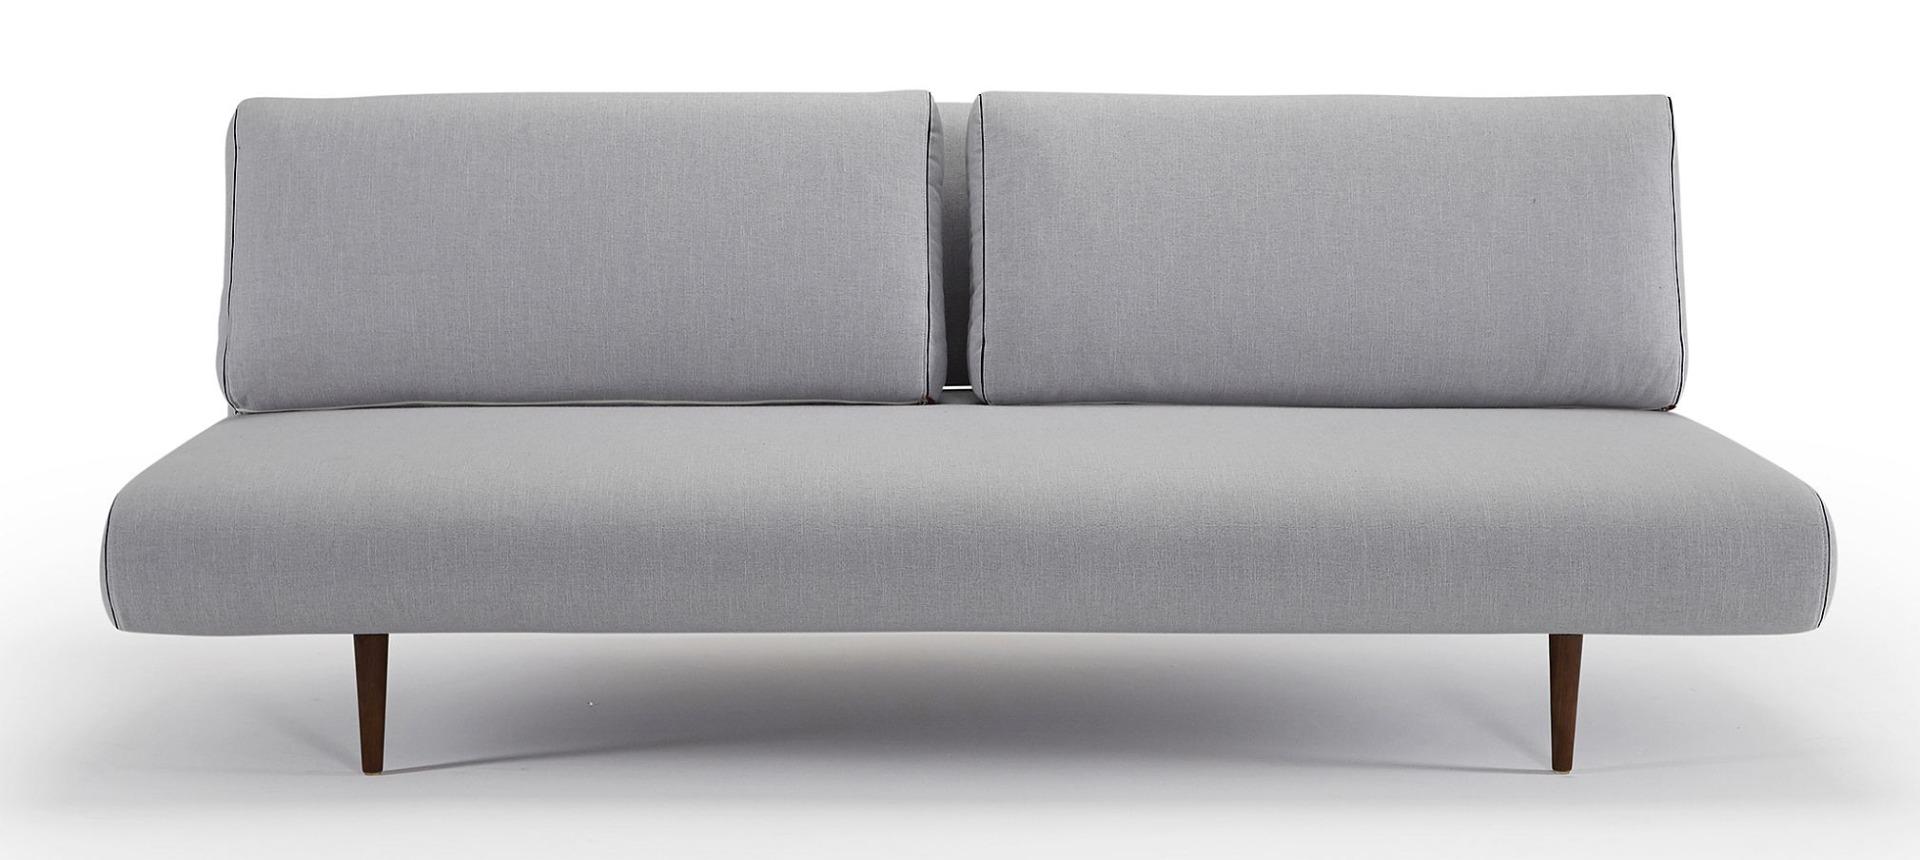 Innovation Slaapbank Unfurl Lounger - Elegance Light Grey 517